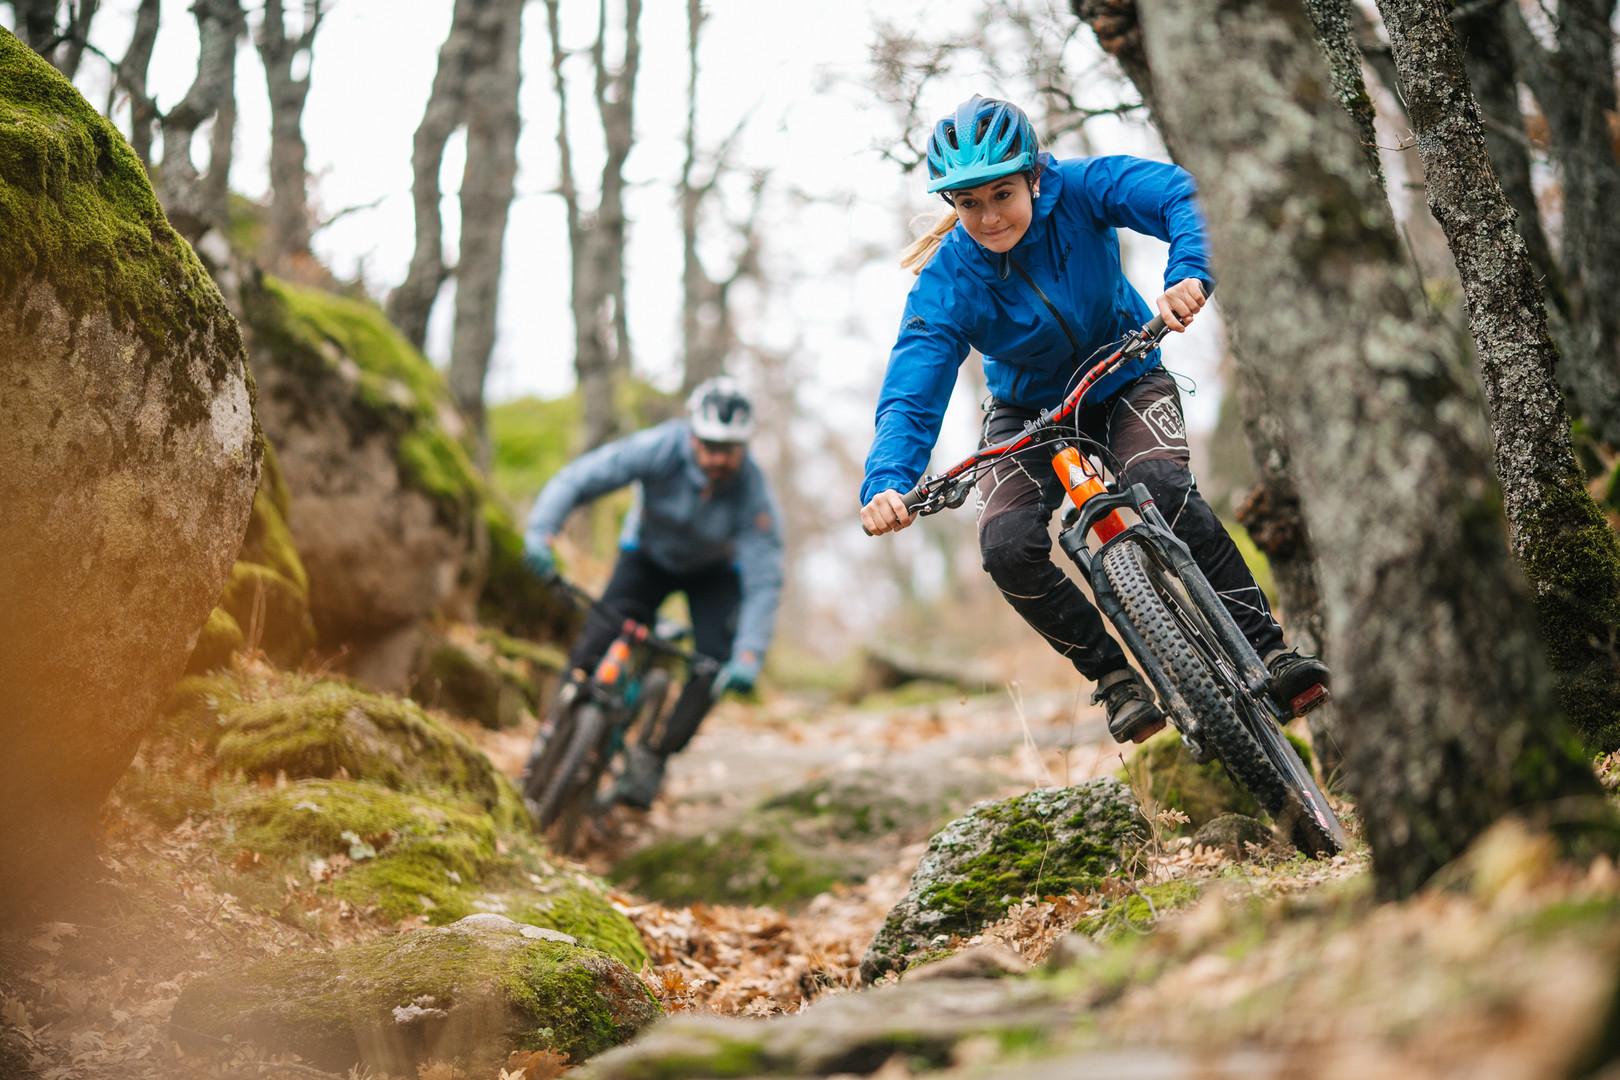 Blacktown Trails for Pinkbike